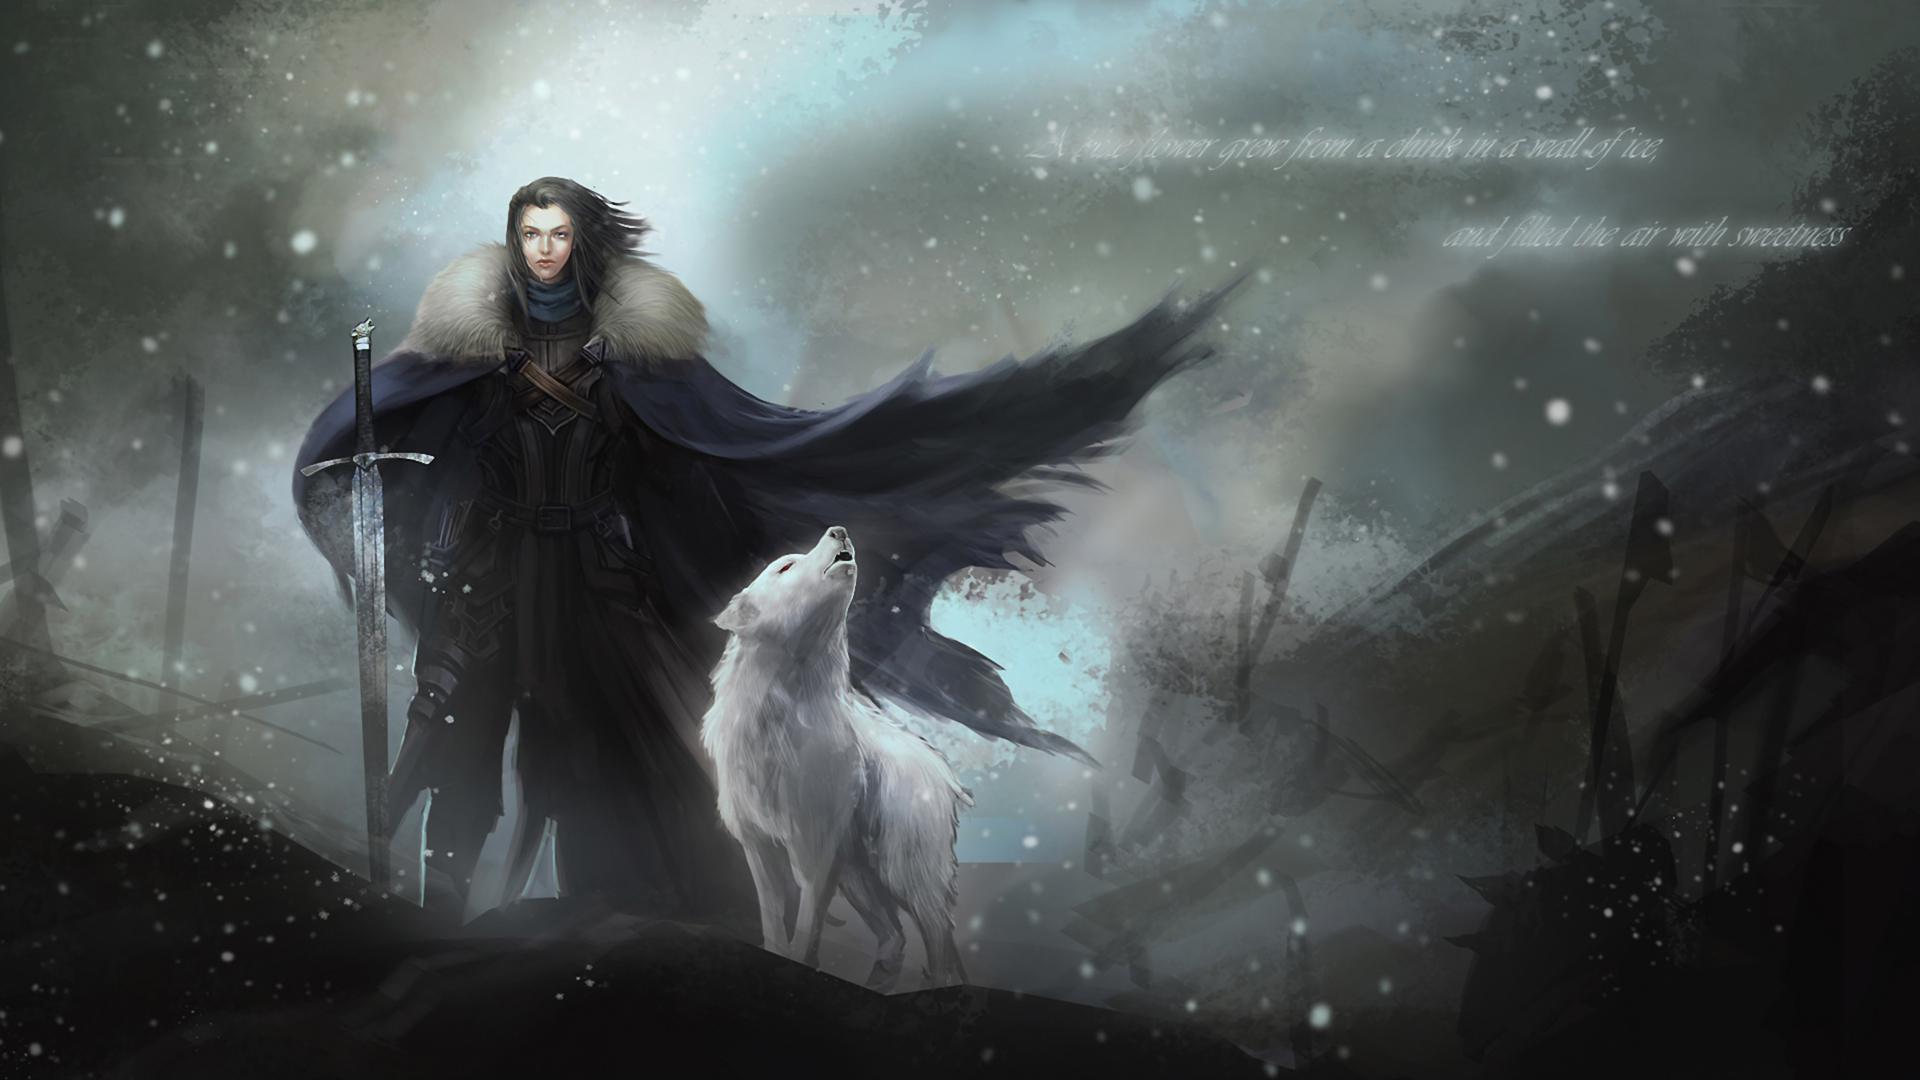 Saif Ali Khan Hd Wallpaper Facebook Covers For Game Of Thrones 85 96 Popopics Com